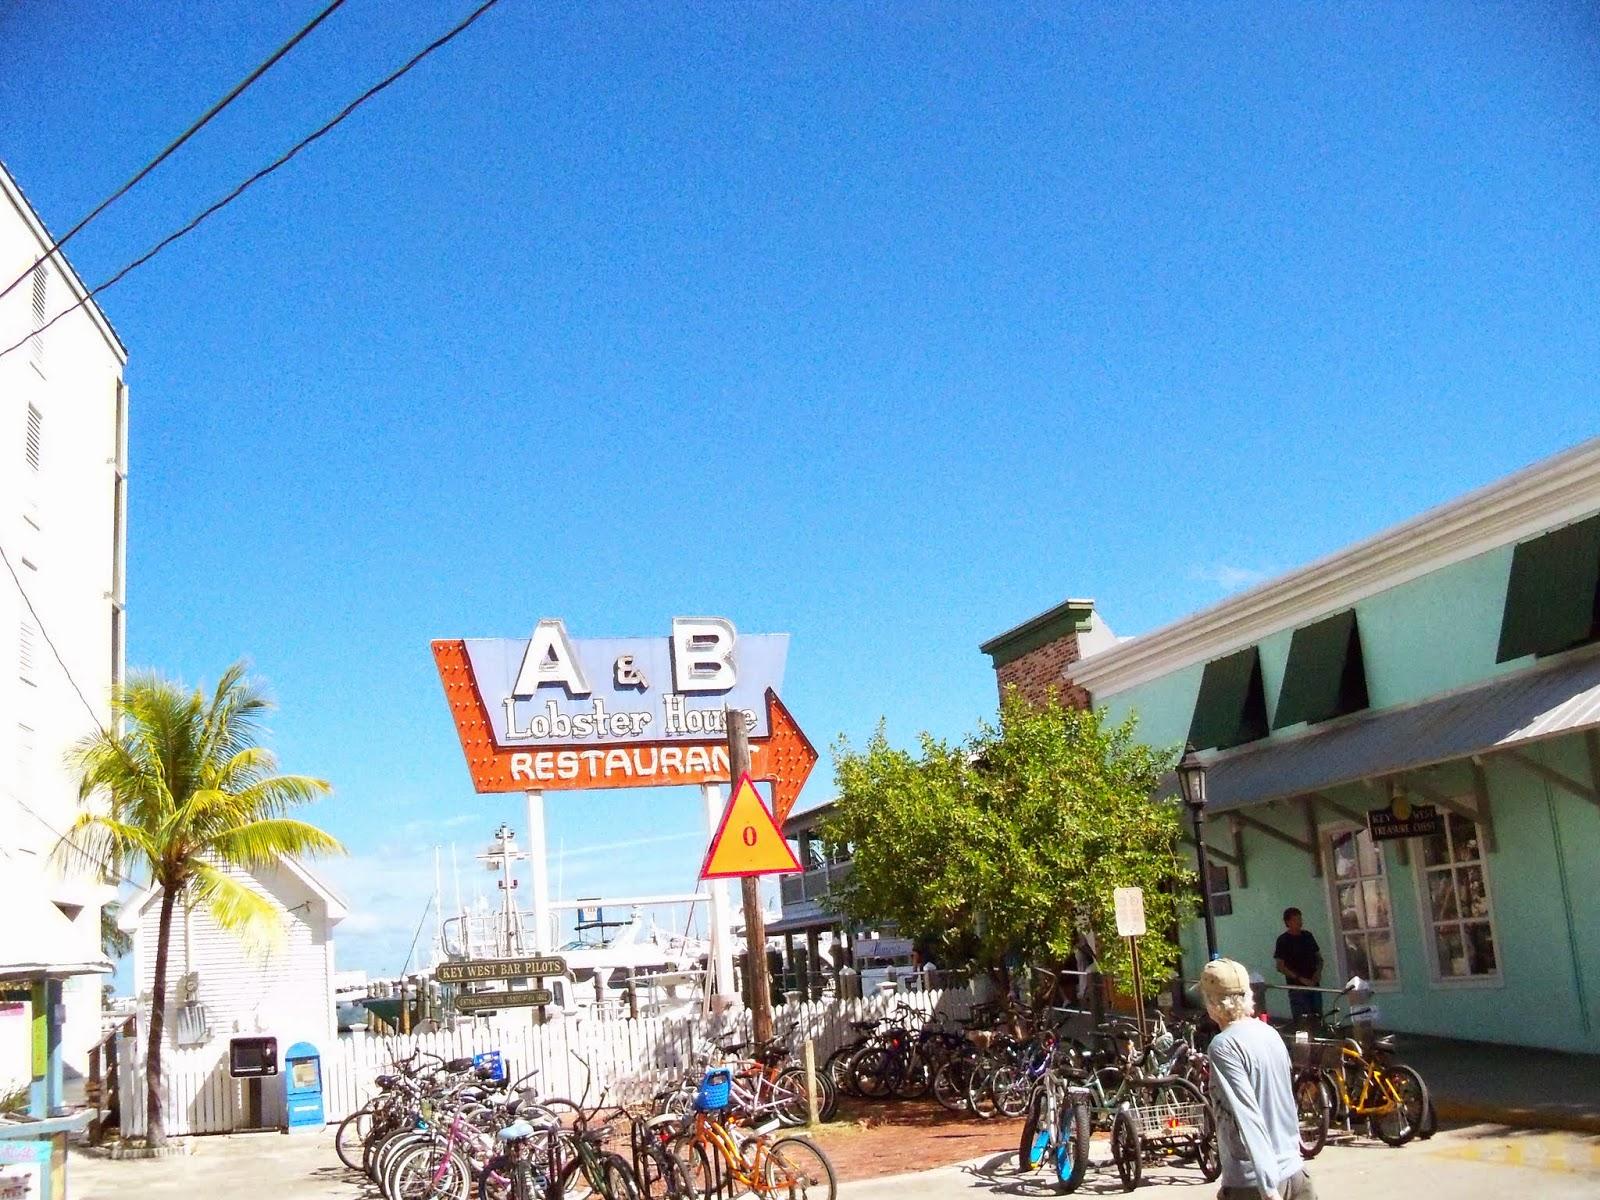 Key West Vacation - 116_5499.JPG